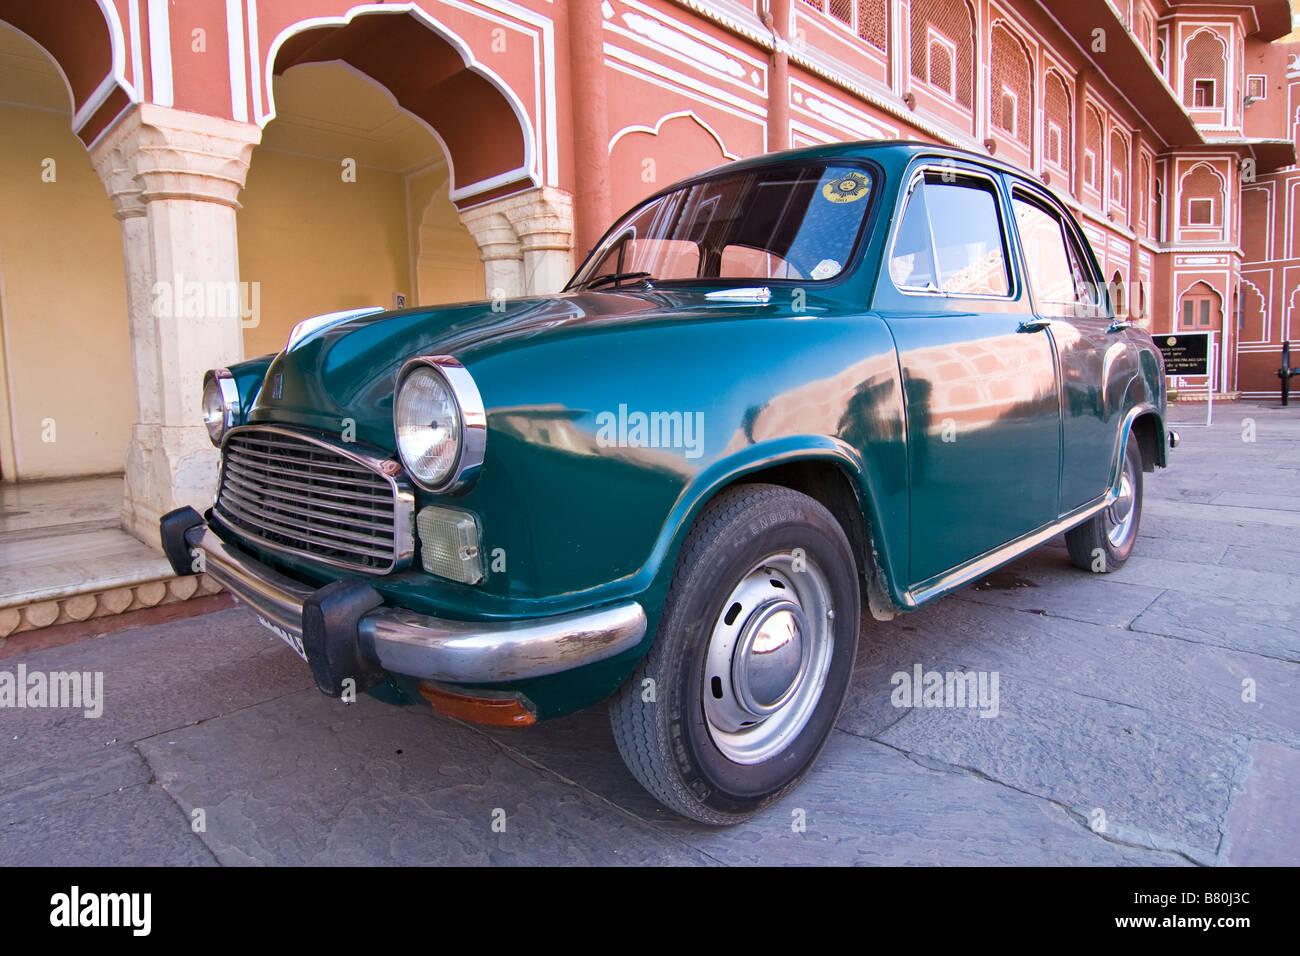 Green Hindustan Motors Ambassador Car, Formerly the Morris Oxford, at the City Palace Museum Jaipur, Rajasthan, - Stock Image